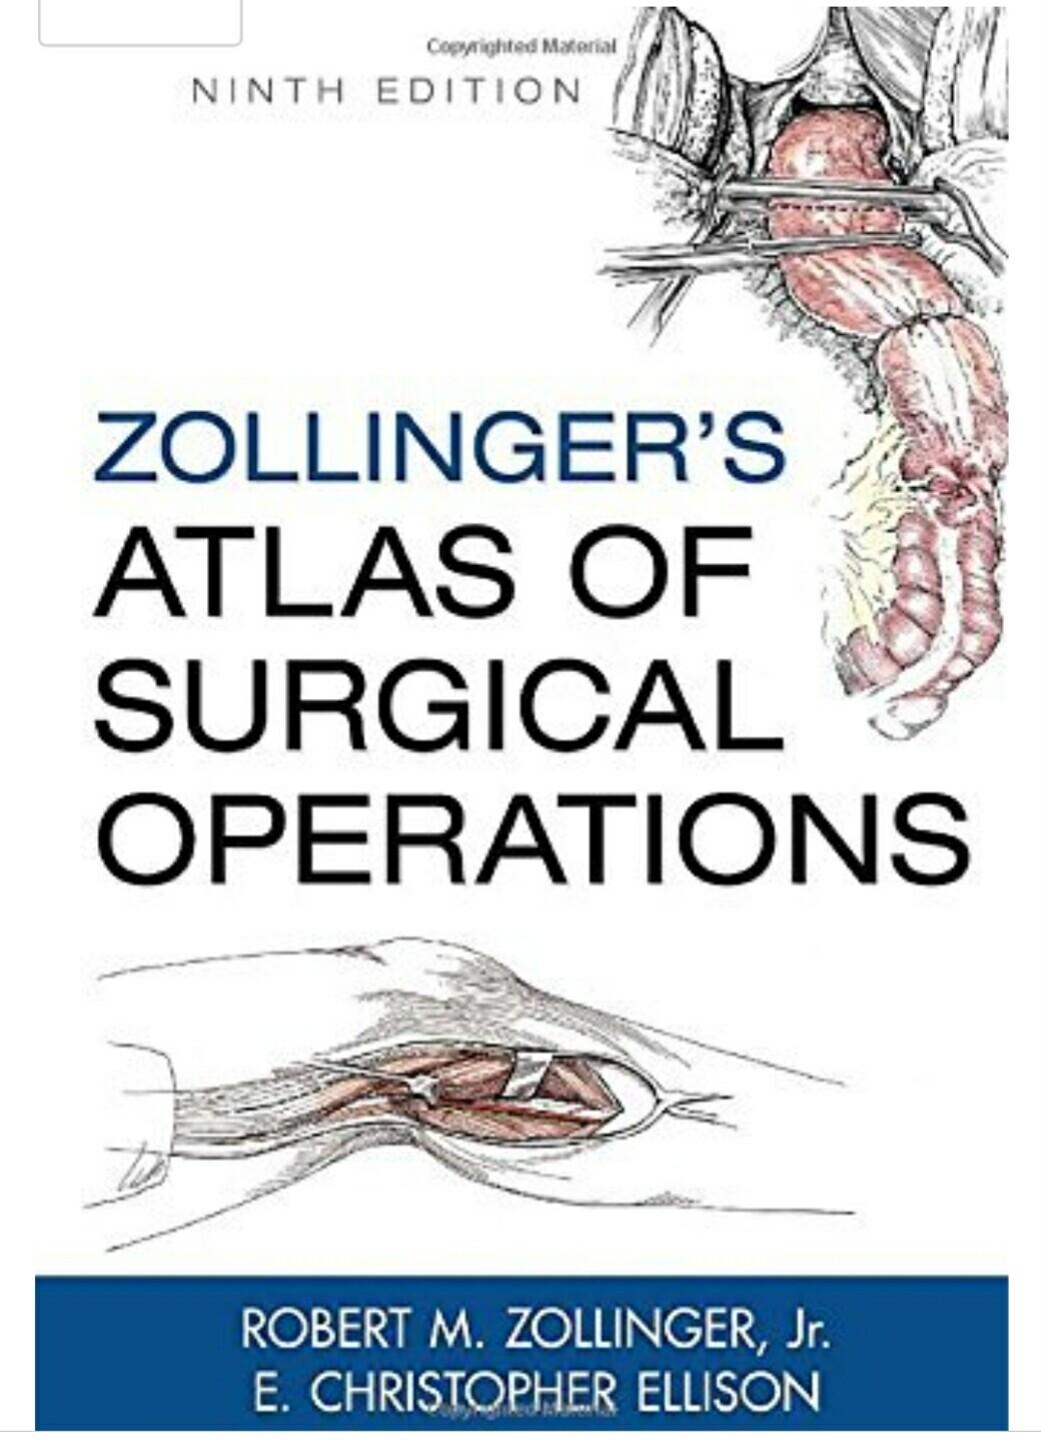 Robert Zollinger Jr Zollinger S Atlas Of Surgical Operations 9th